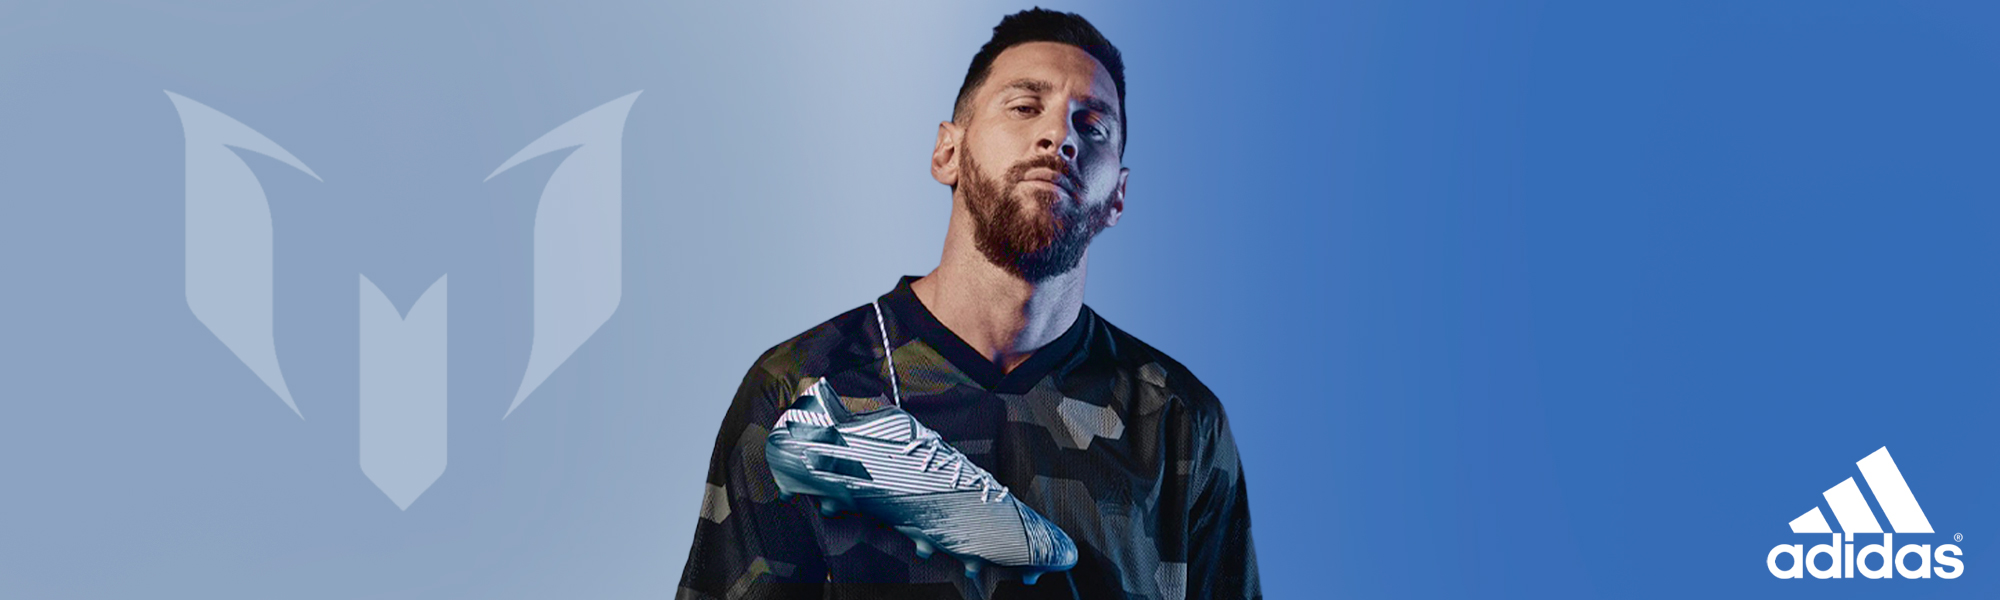 Shop For Your Lionel Messi Jersey Soccerpro Com